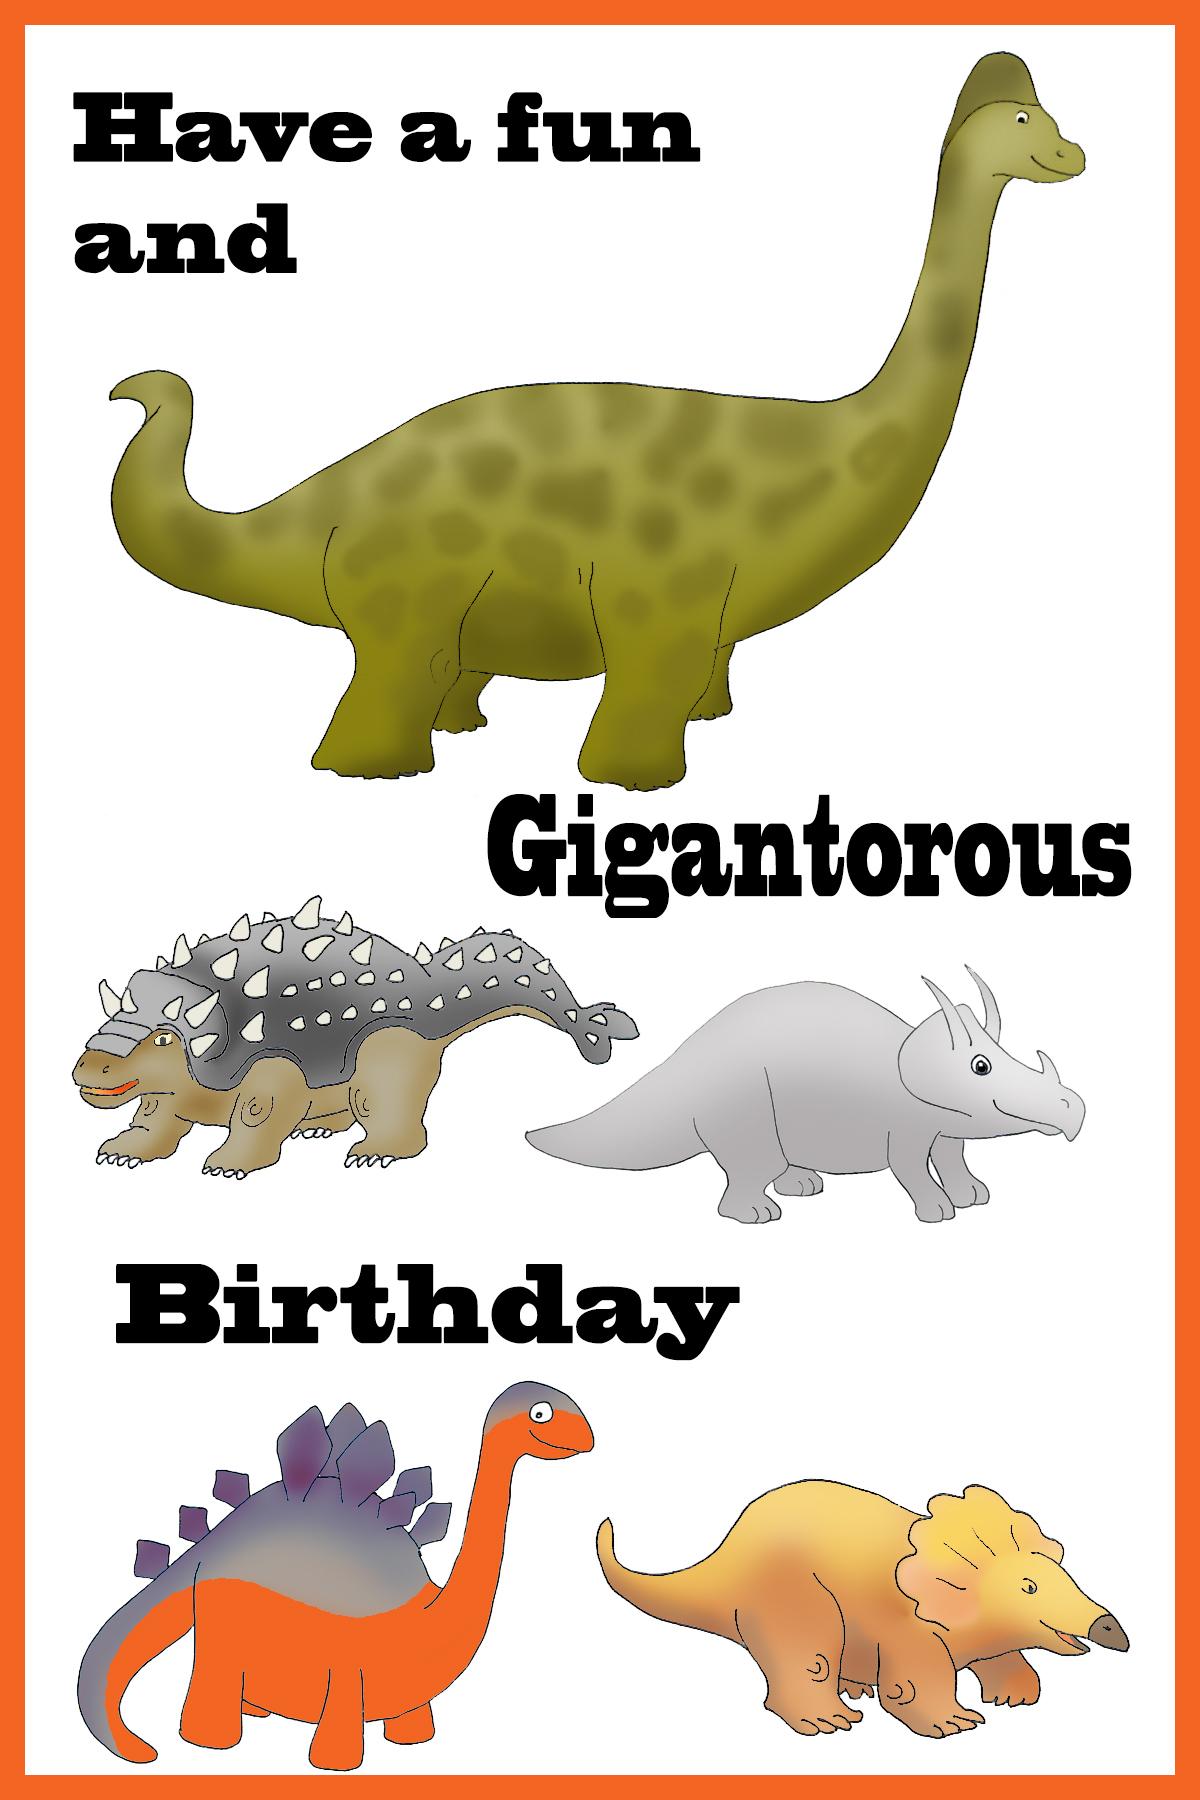 funny dino birthday card